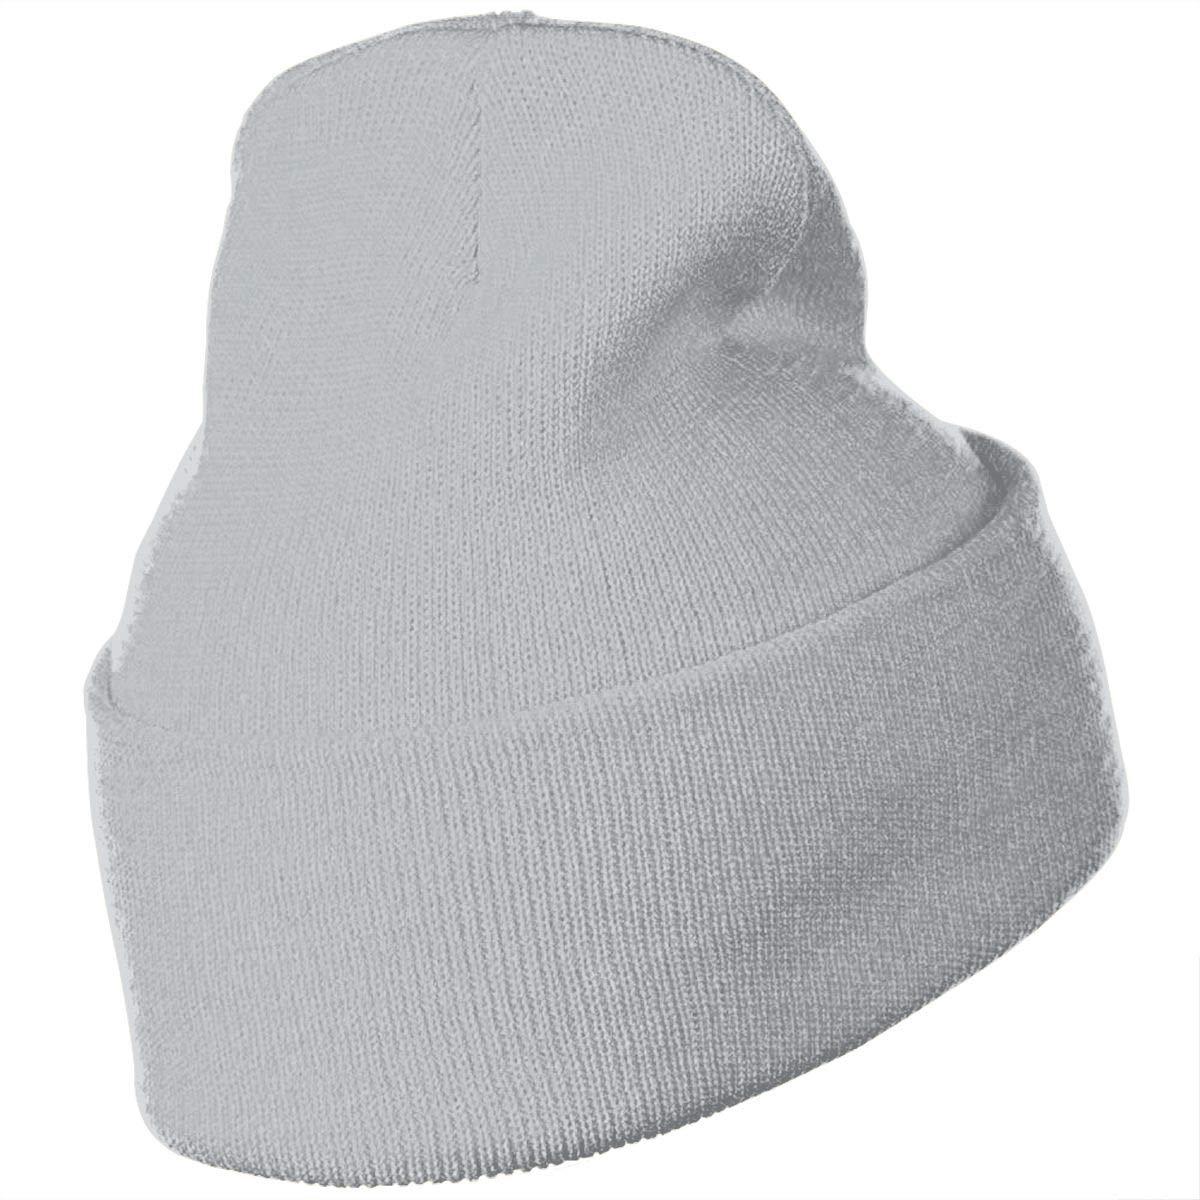 QZqDQ Free American Flag Unisex Fashion Knitted Hat Luxury Hip-Hop Cap